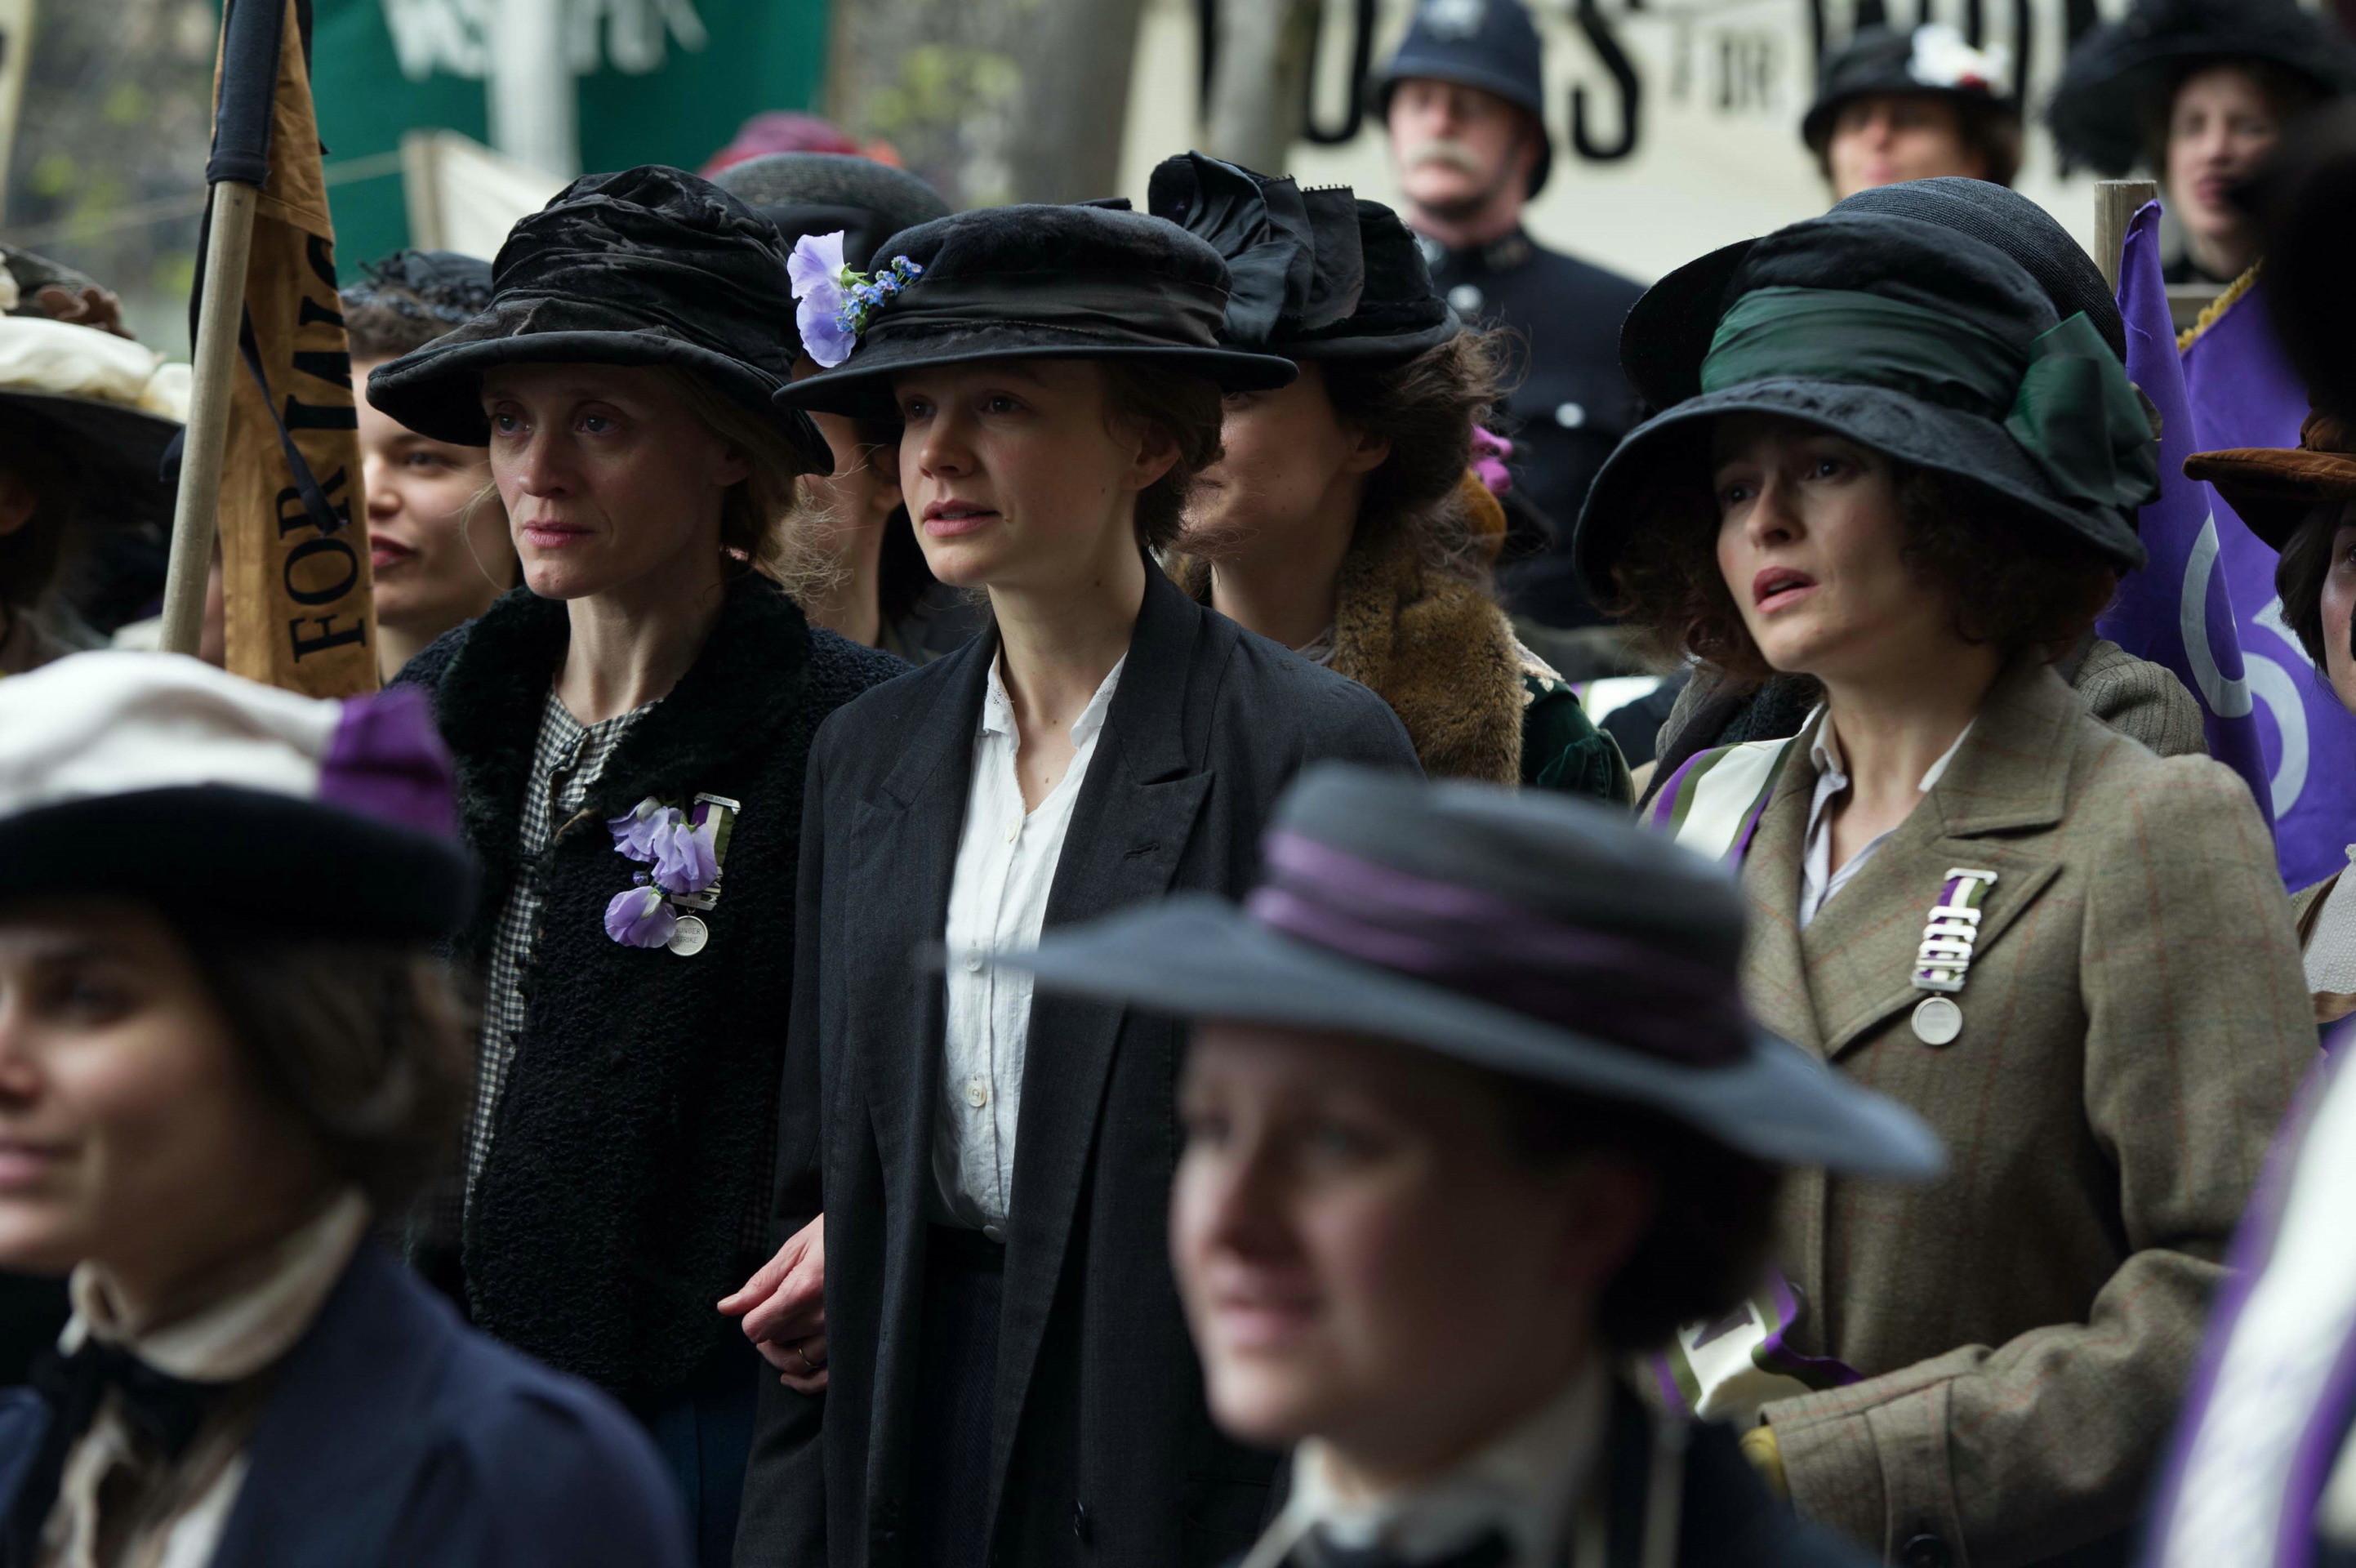 https://forumwk.de/wp-content/uploads/2016/03/suffragette-4-rcm0x1920u.jpg